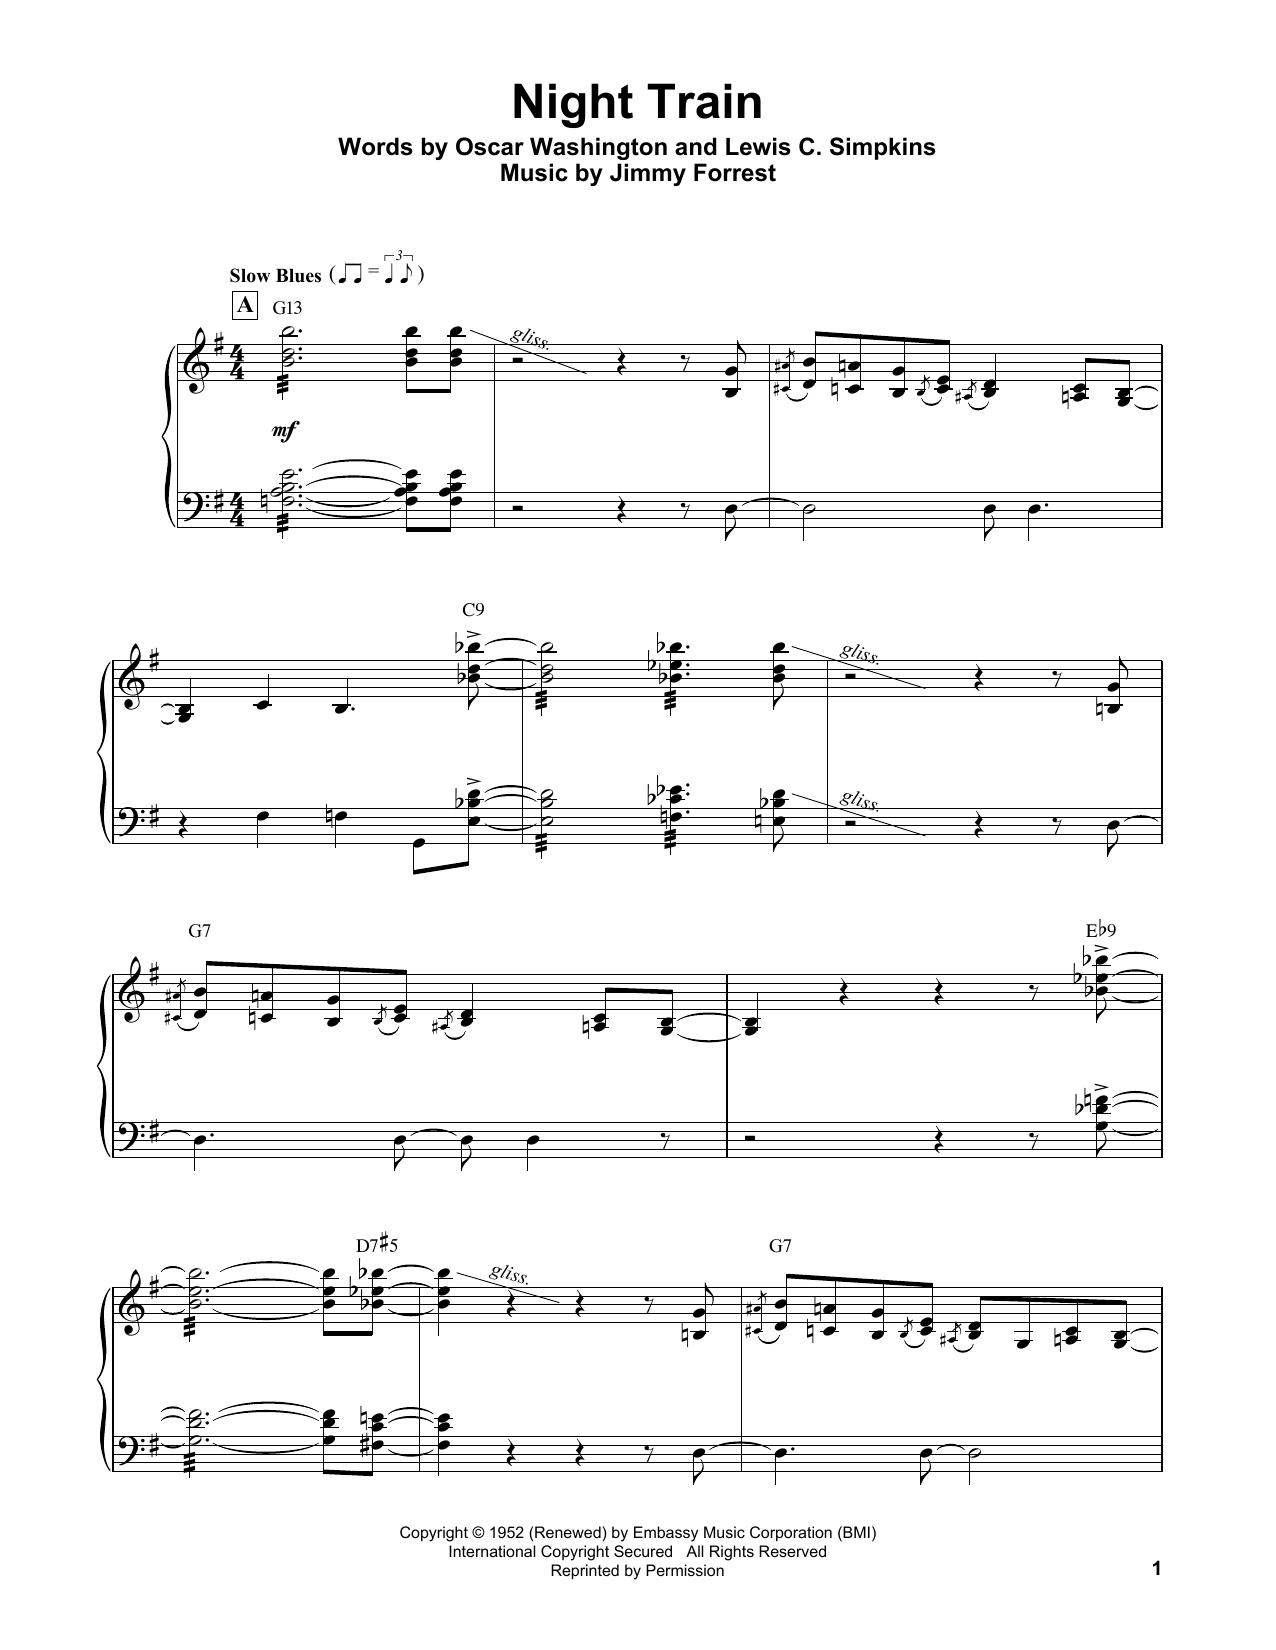 Oscar Peterson 'Night Train' Sheet Music Notes, Chords | Download Printable  Piano Transcription - SKU: 199021